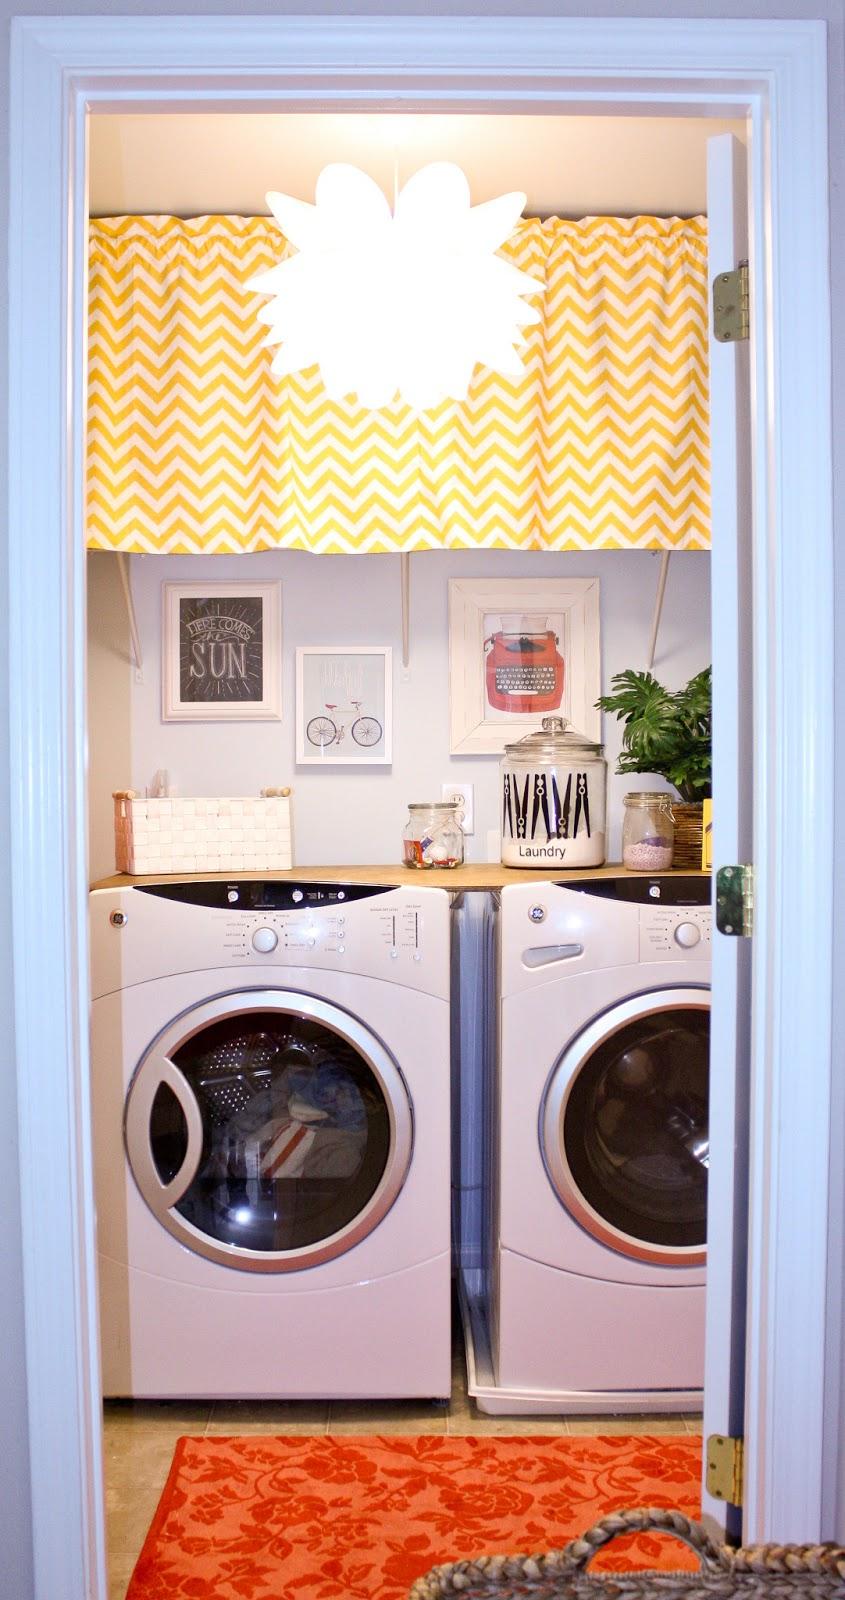 Cute Laundry Room Decor Ideas hoot designs - laundry room makeover - shanty 2 chic